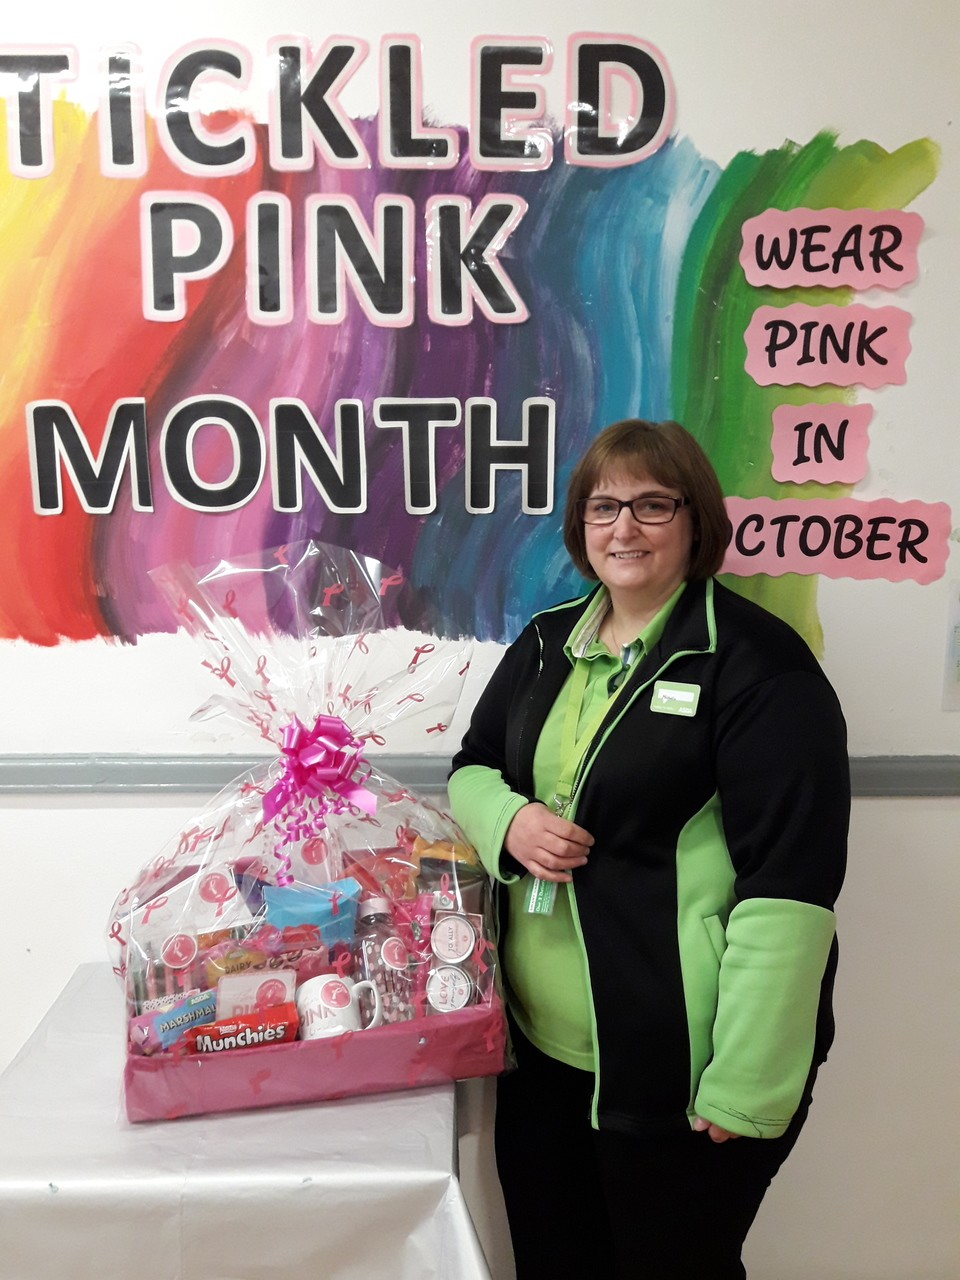 Tickled Pink winner | Asda Leicester